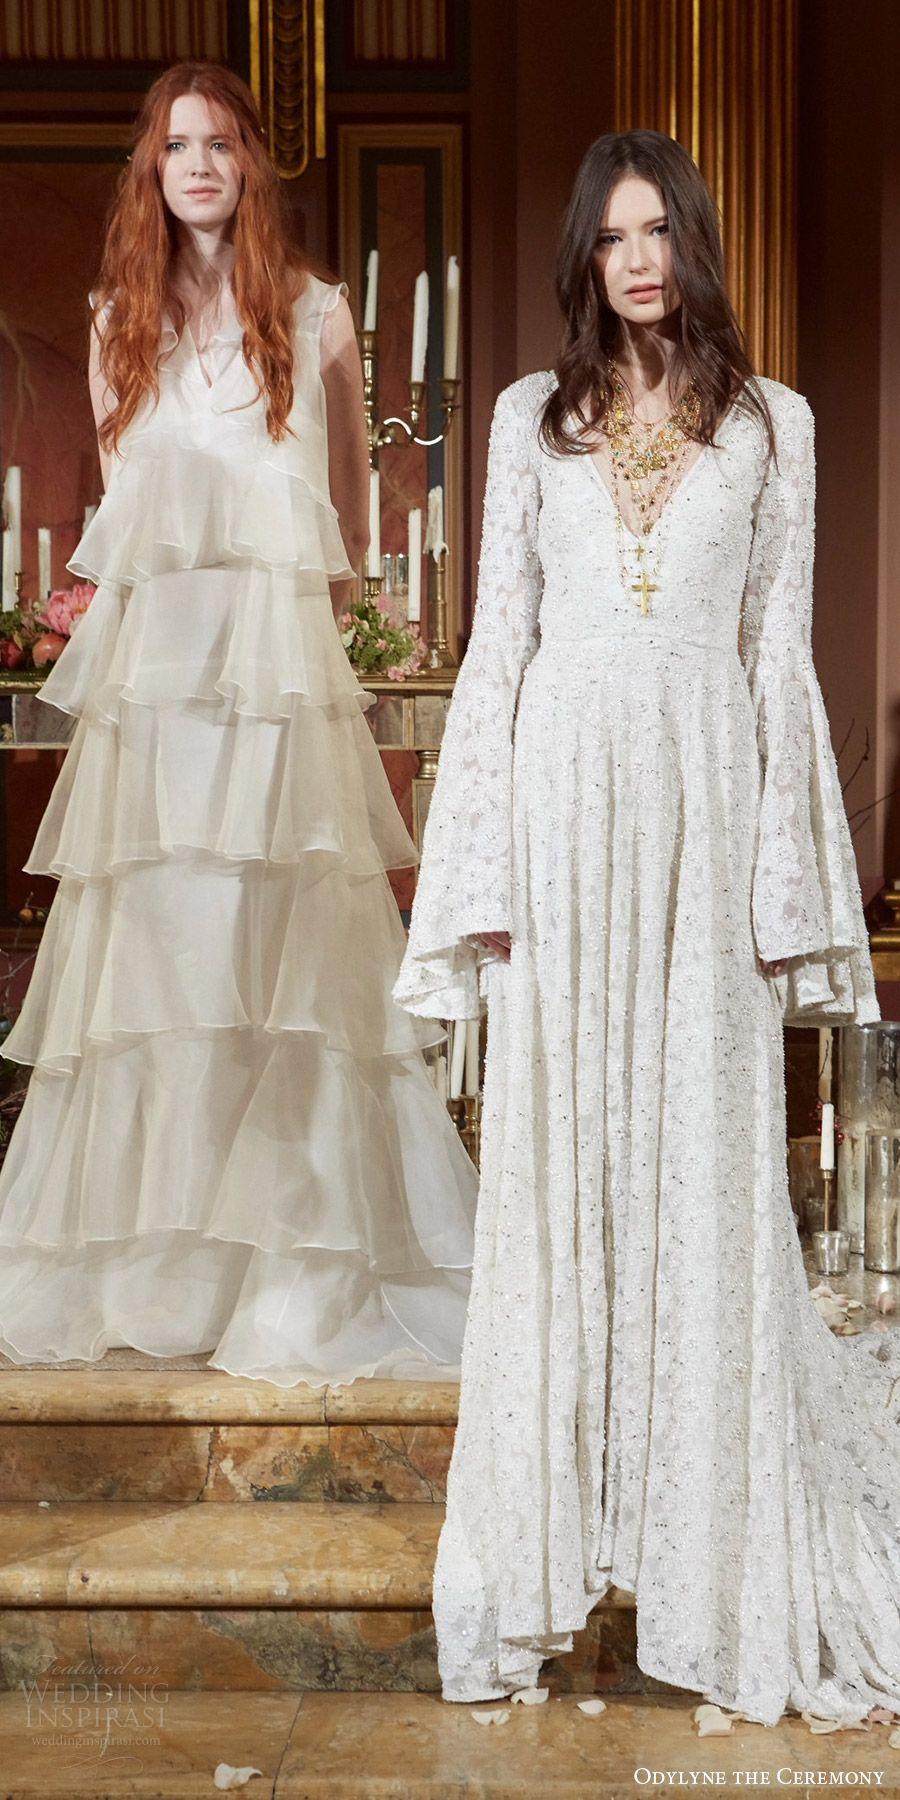 Odylyne The Ceremony Fall 2017 Wedding Dresses New York Bridal Week Highlights